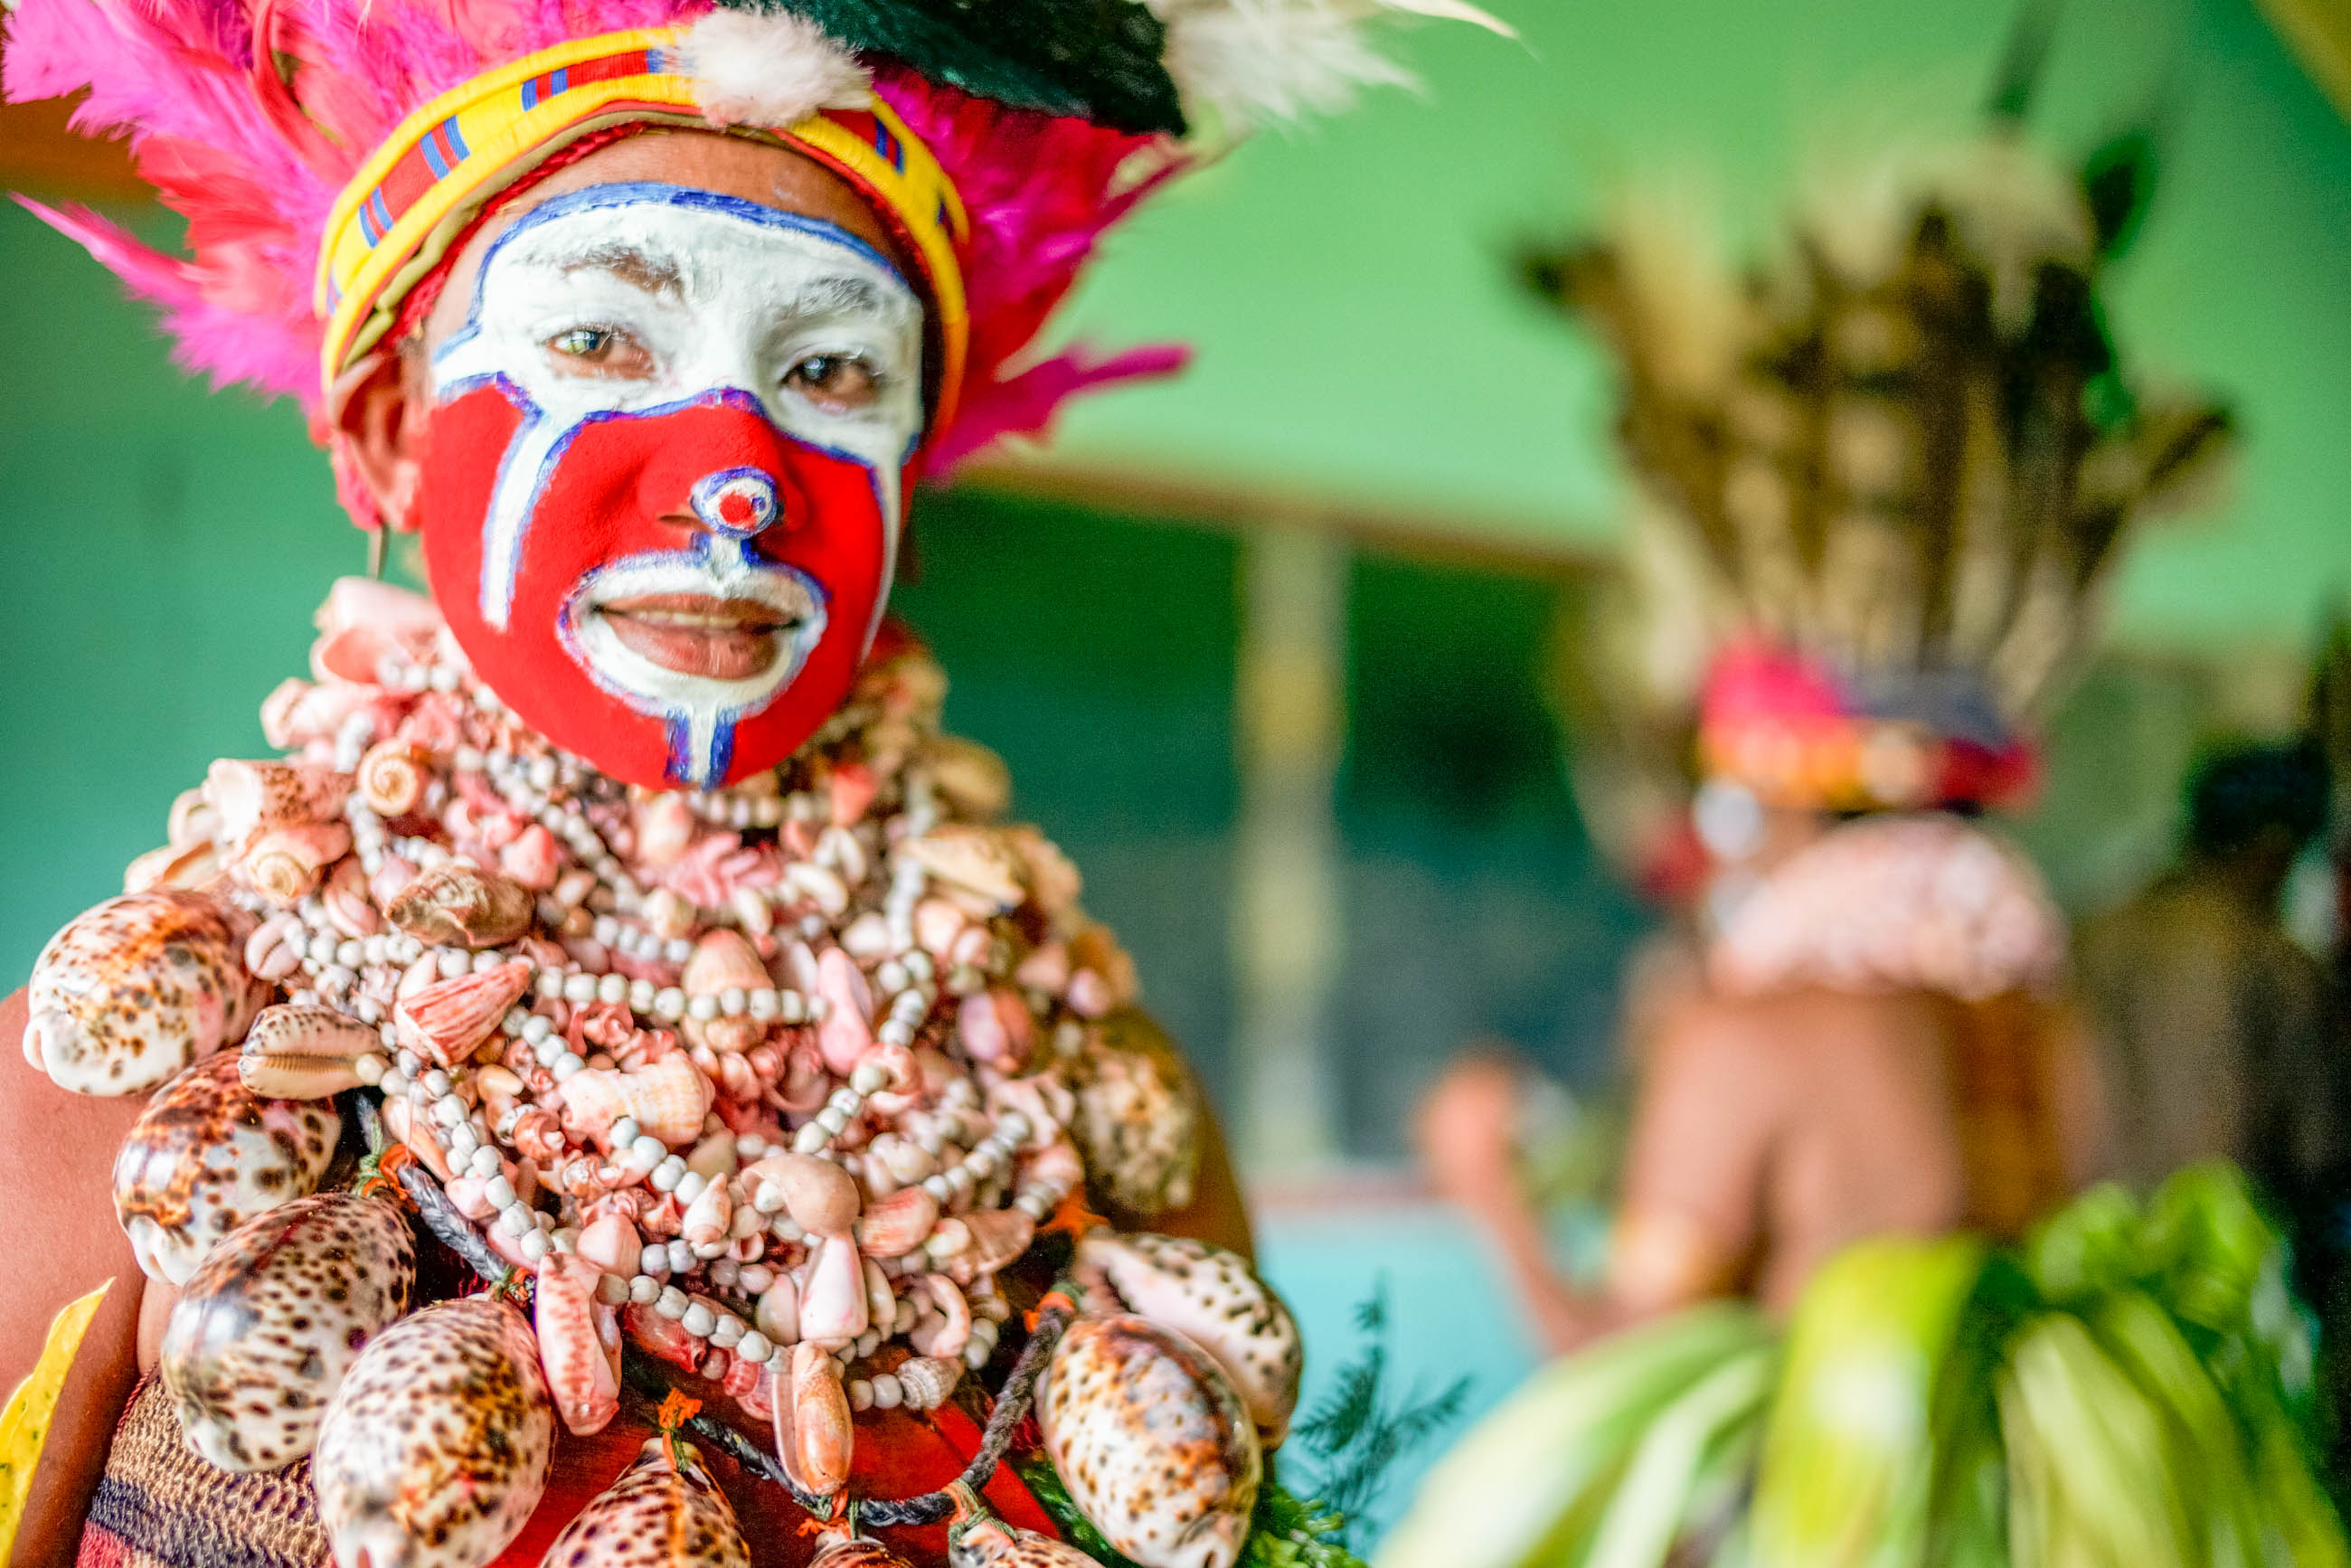 https://bubo.sk/uploads/galleries/7442/lubosfellner_papuanovaguinea_l1009346.jpg